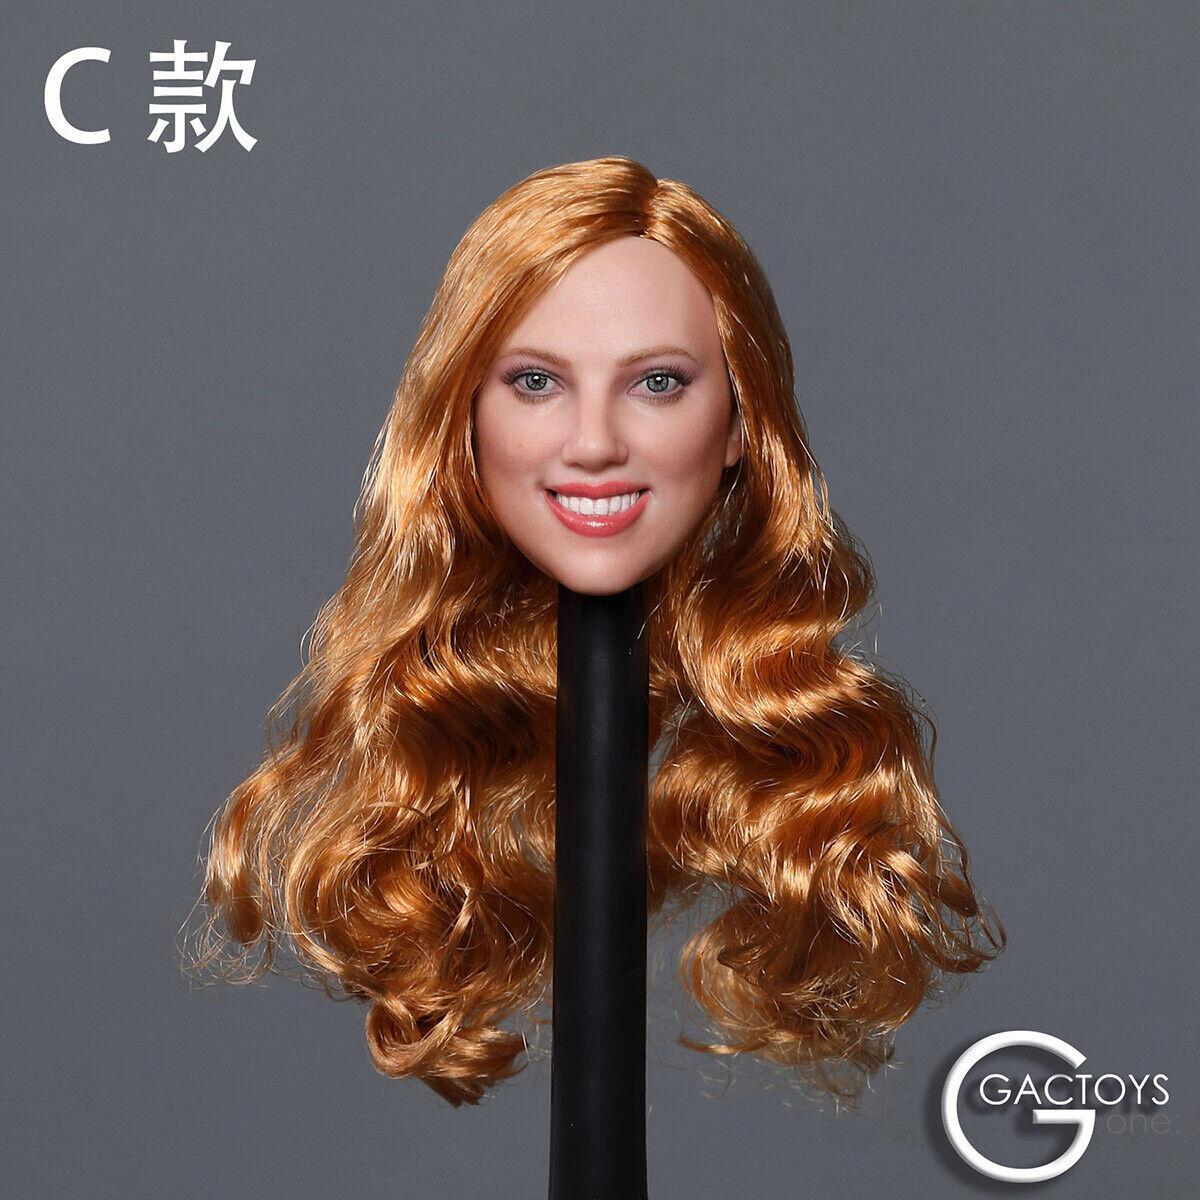 "GACTOYS GC035C 1//6 Smile Girl Long Hair Head Carving Head Model F 12/""Body"